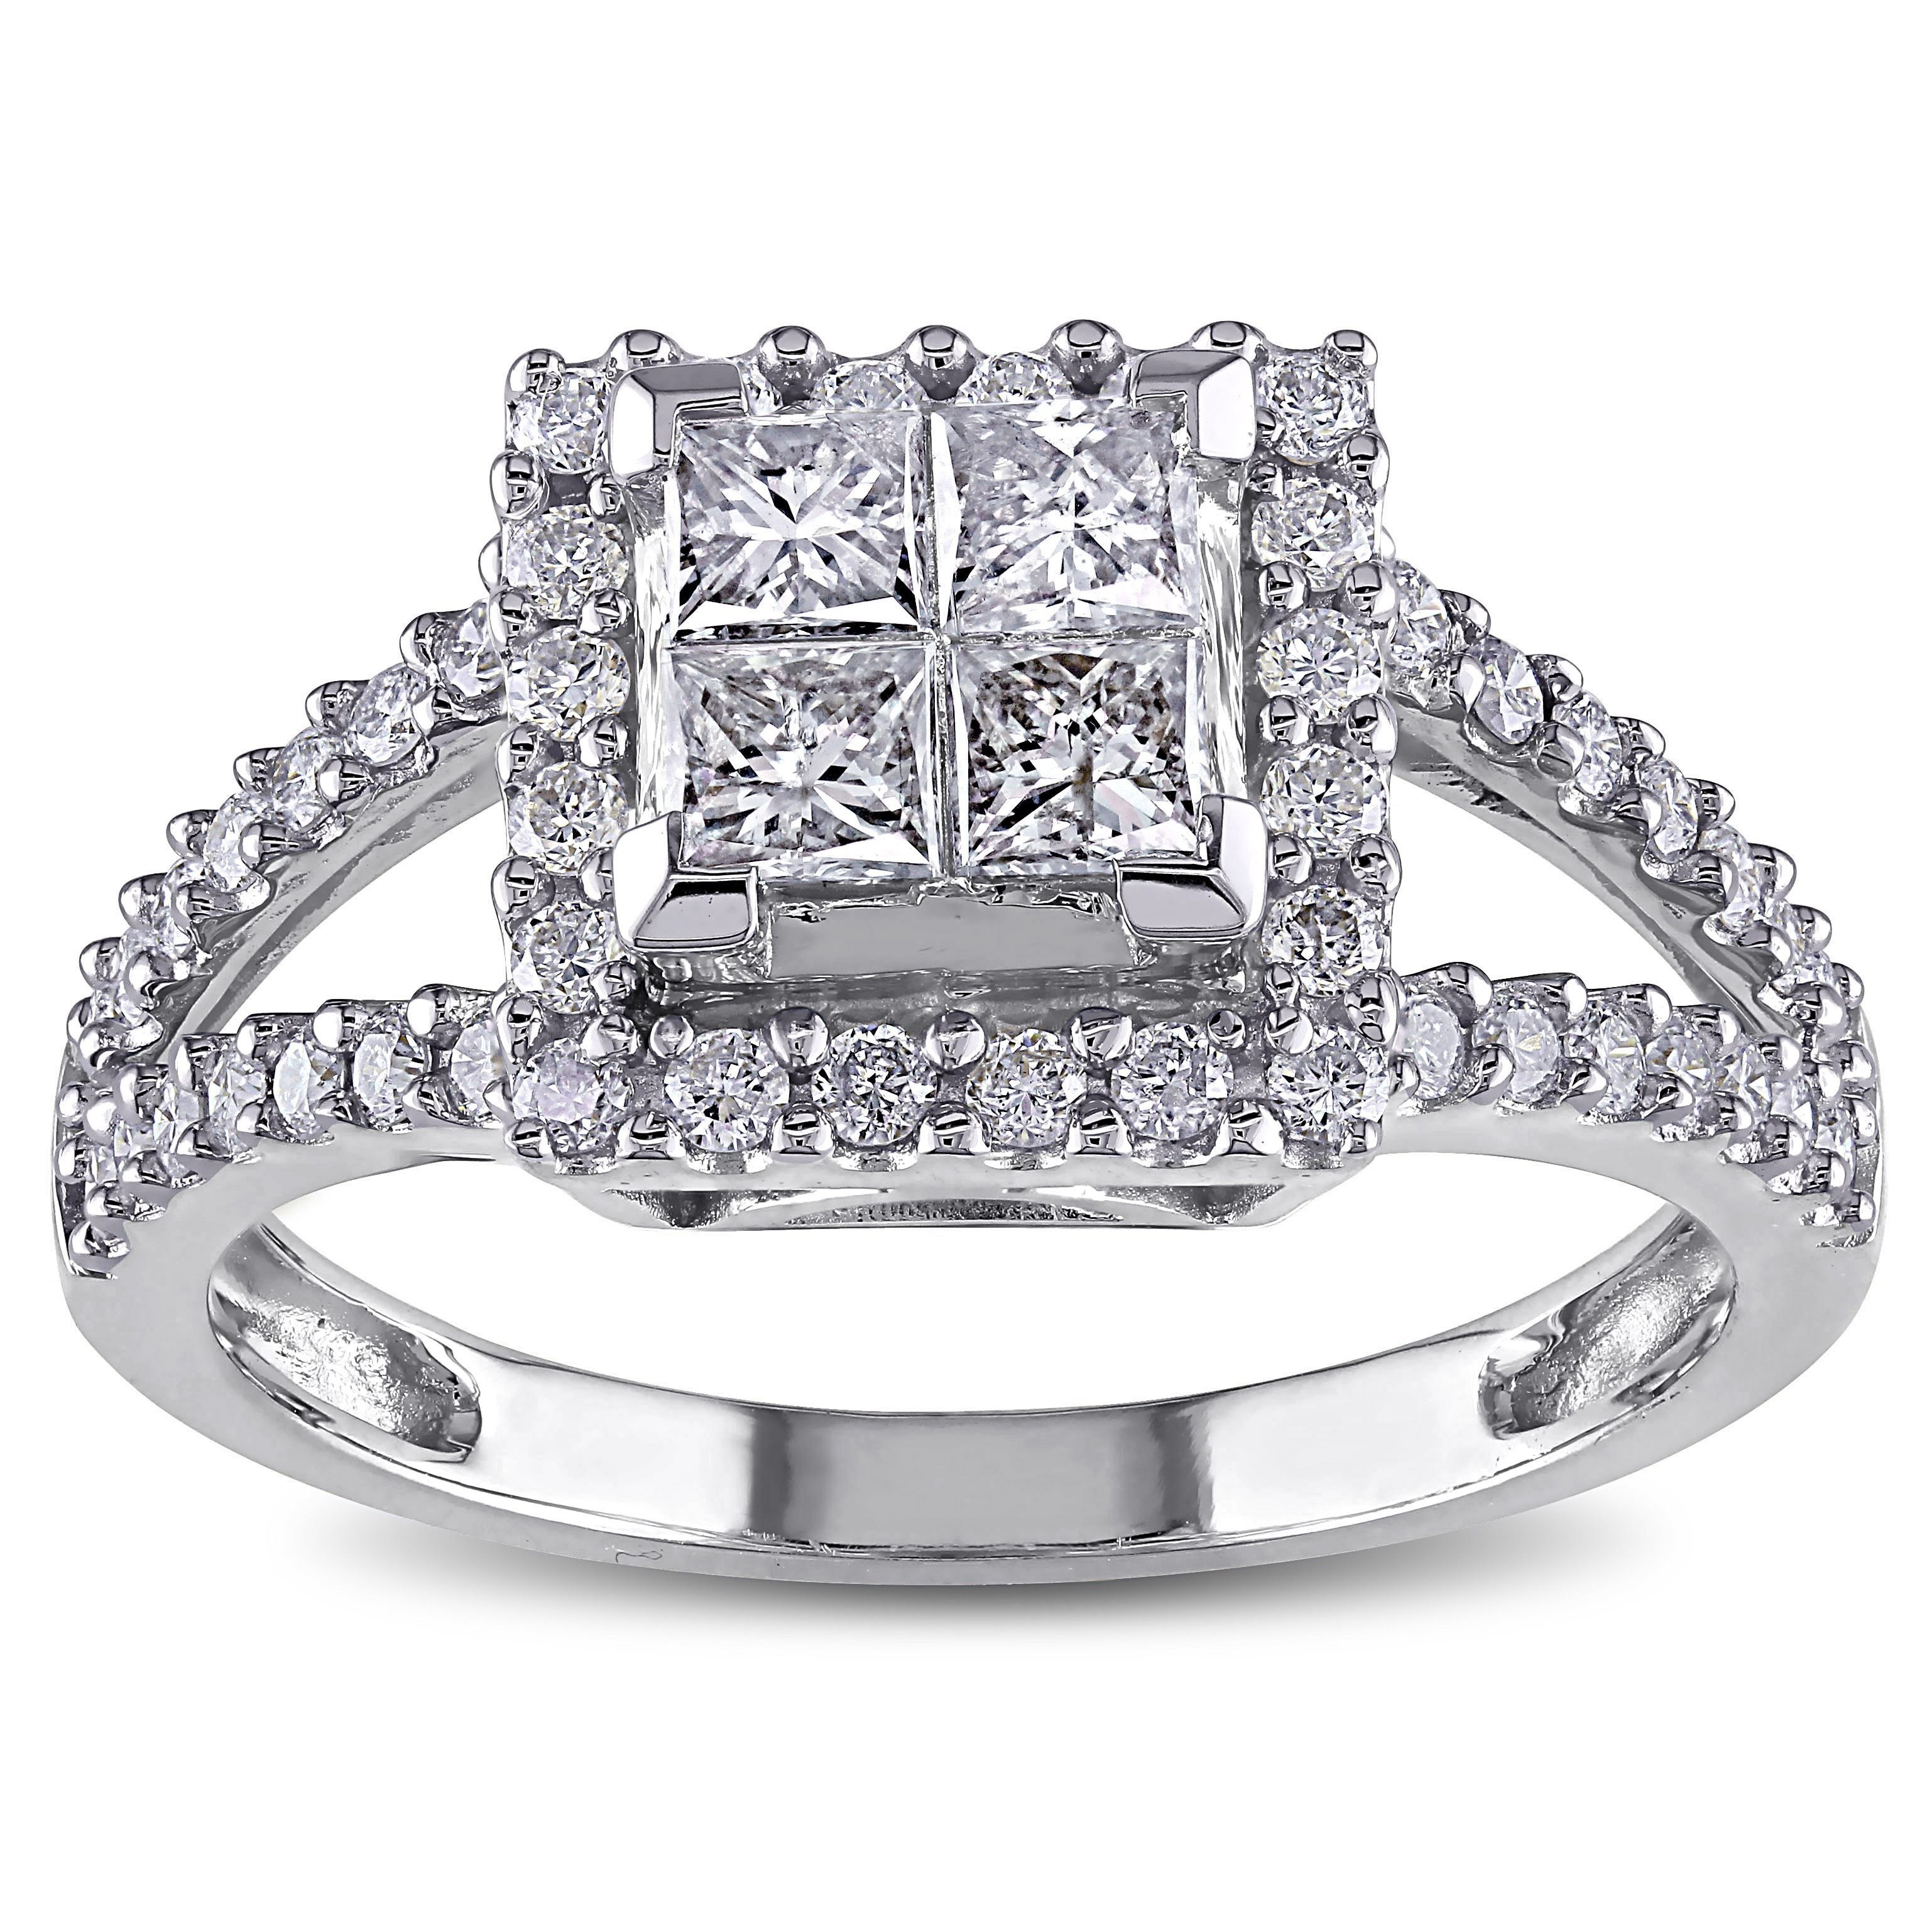 Miadora Signature Collection 14k White Gold 1ct TDW Diamond Princess Cut Halo Engagement Ring (H-I, I2-I3) (Size 4.5), Women's